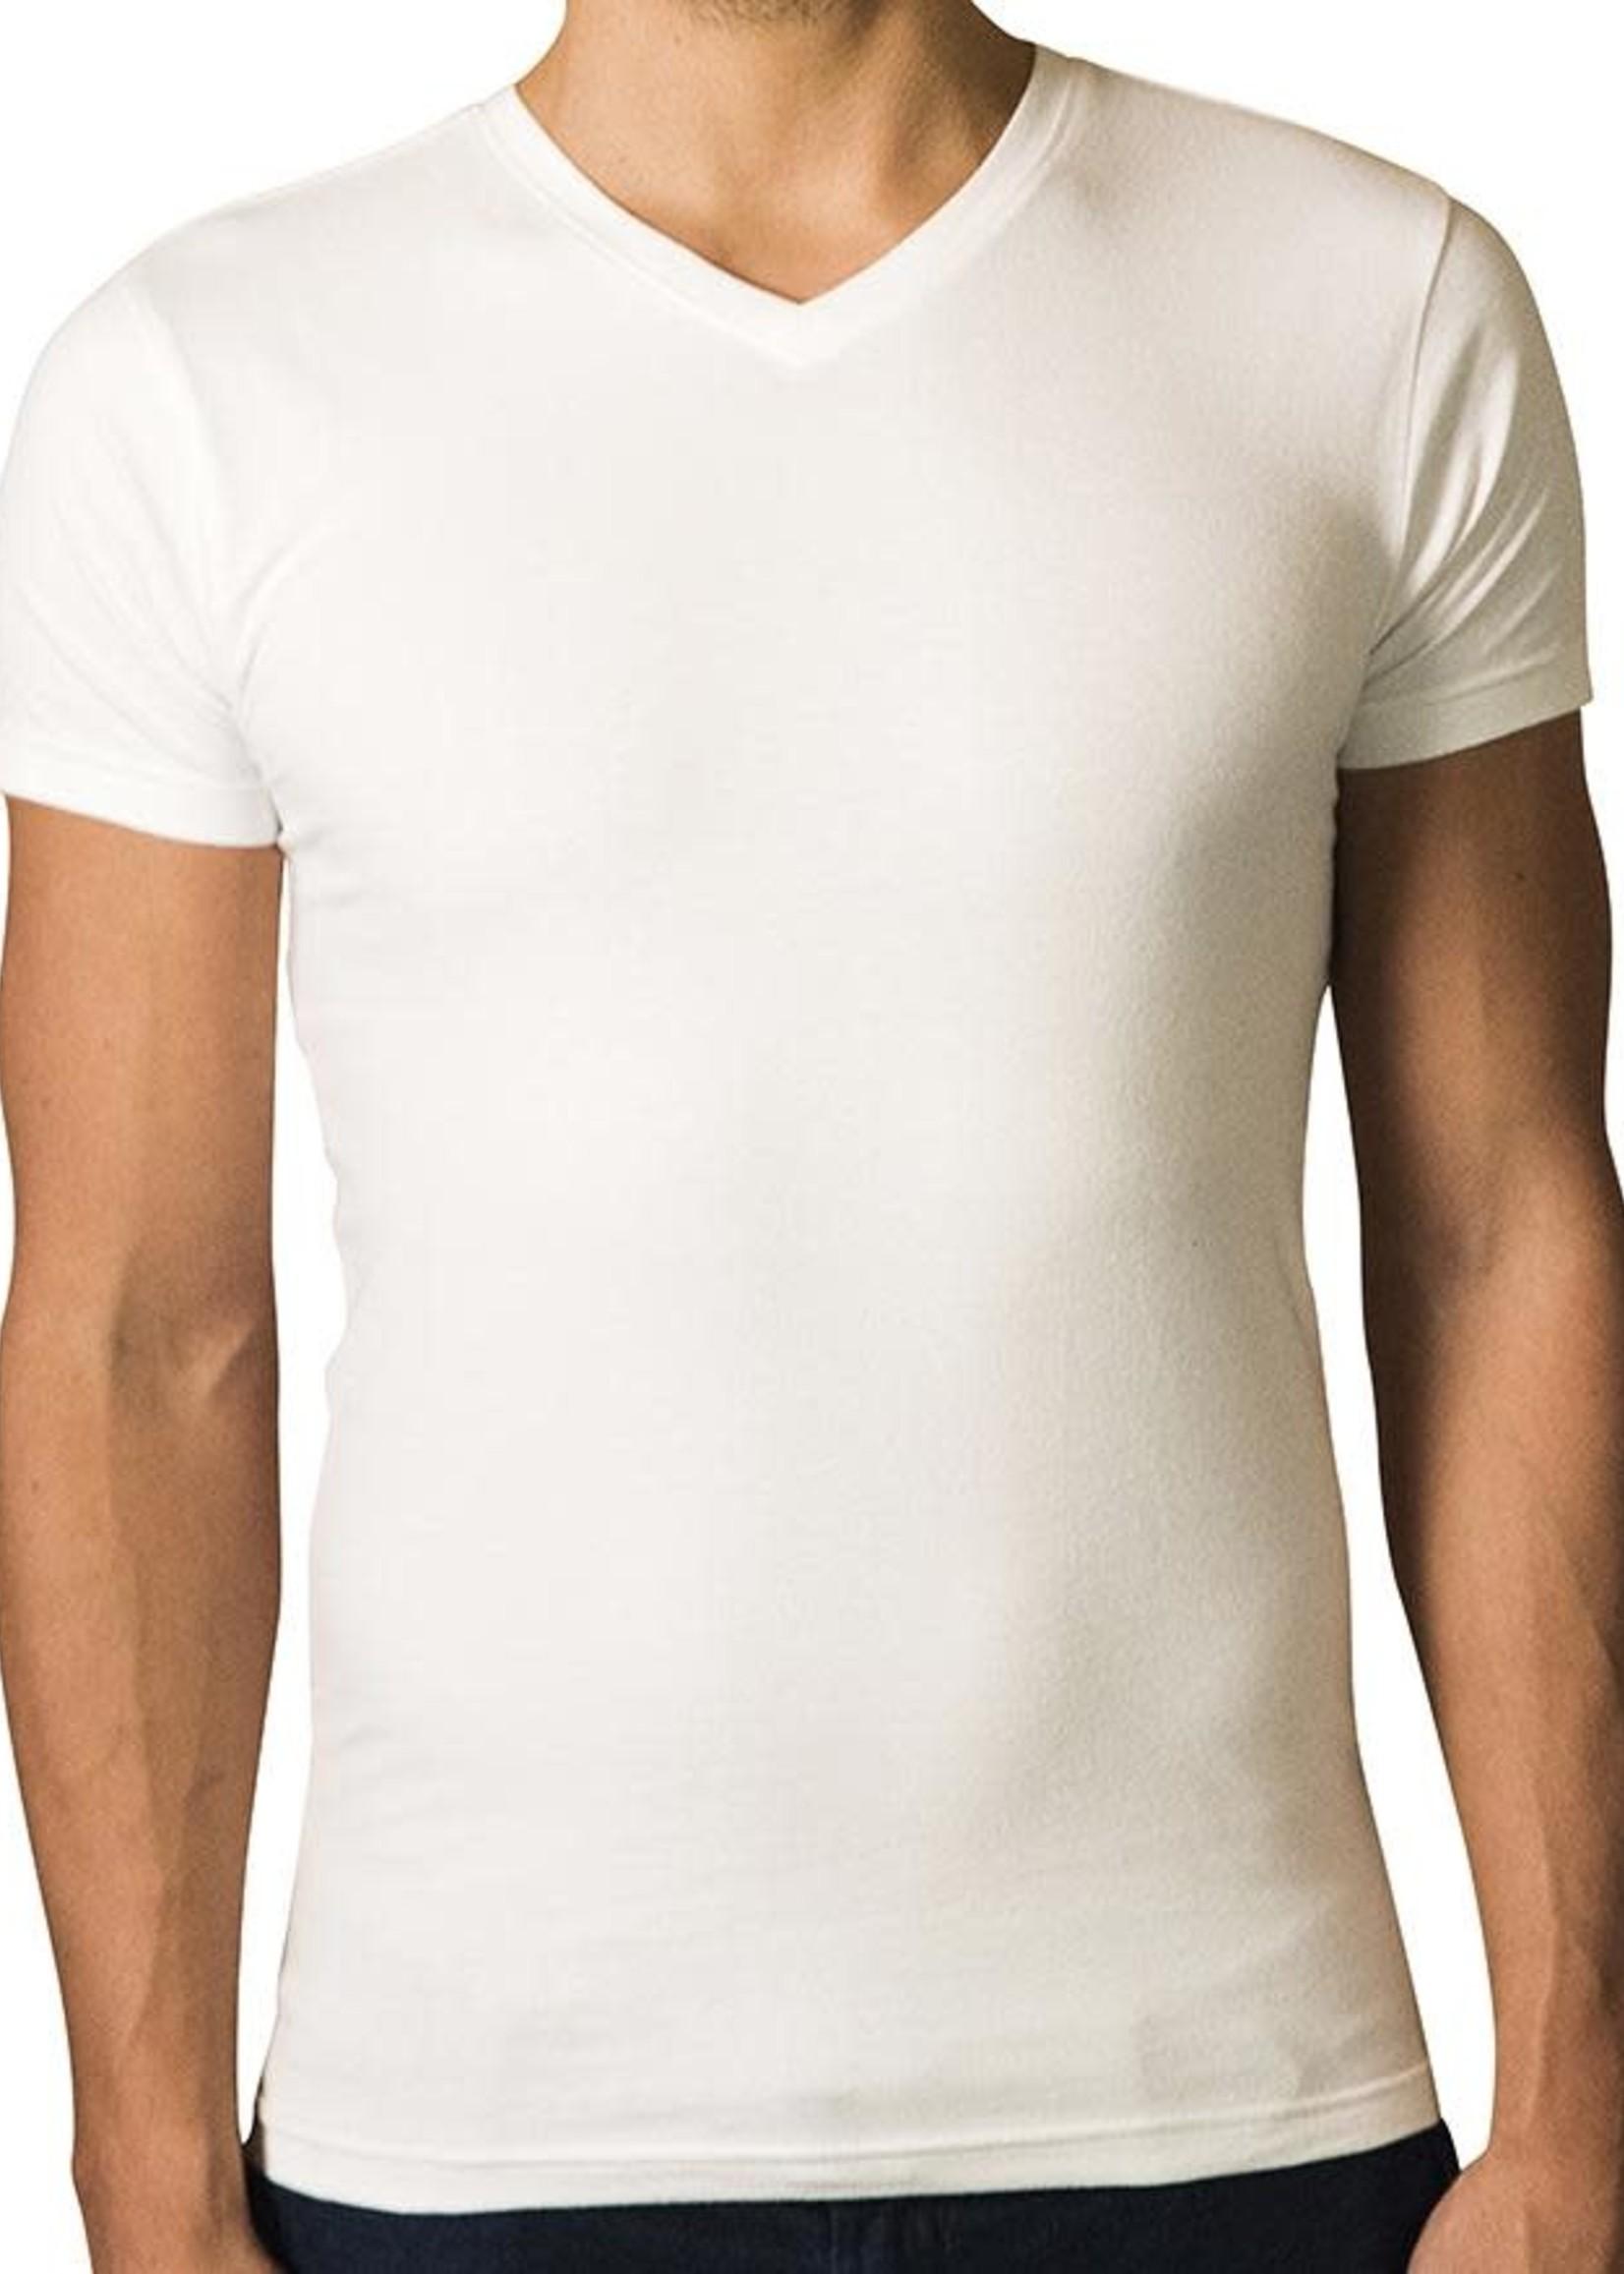 The Driftwood Tales The Driftwood Tales - T-shirt Basic - Biologisch katoen - wit - V - hals